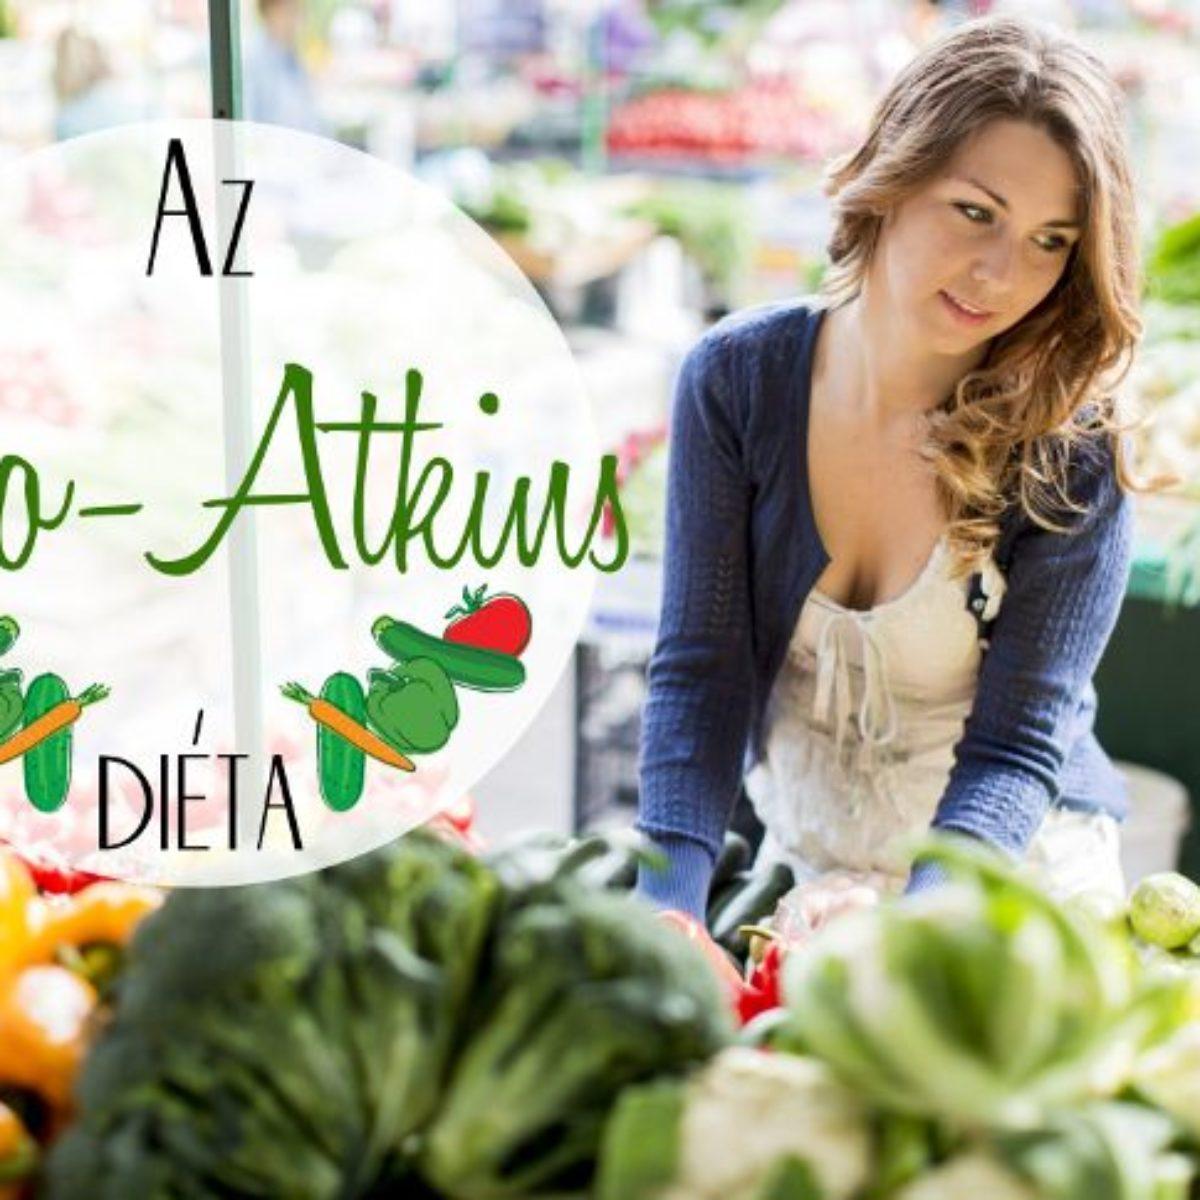 dieta atkins che consiste